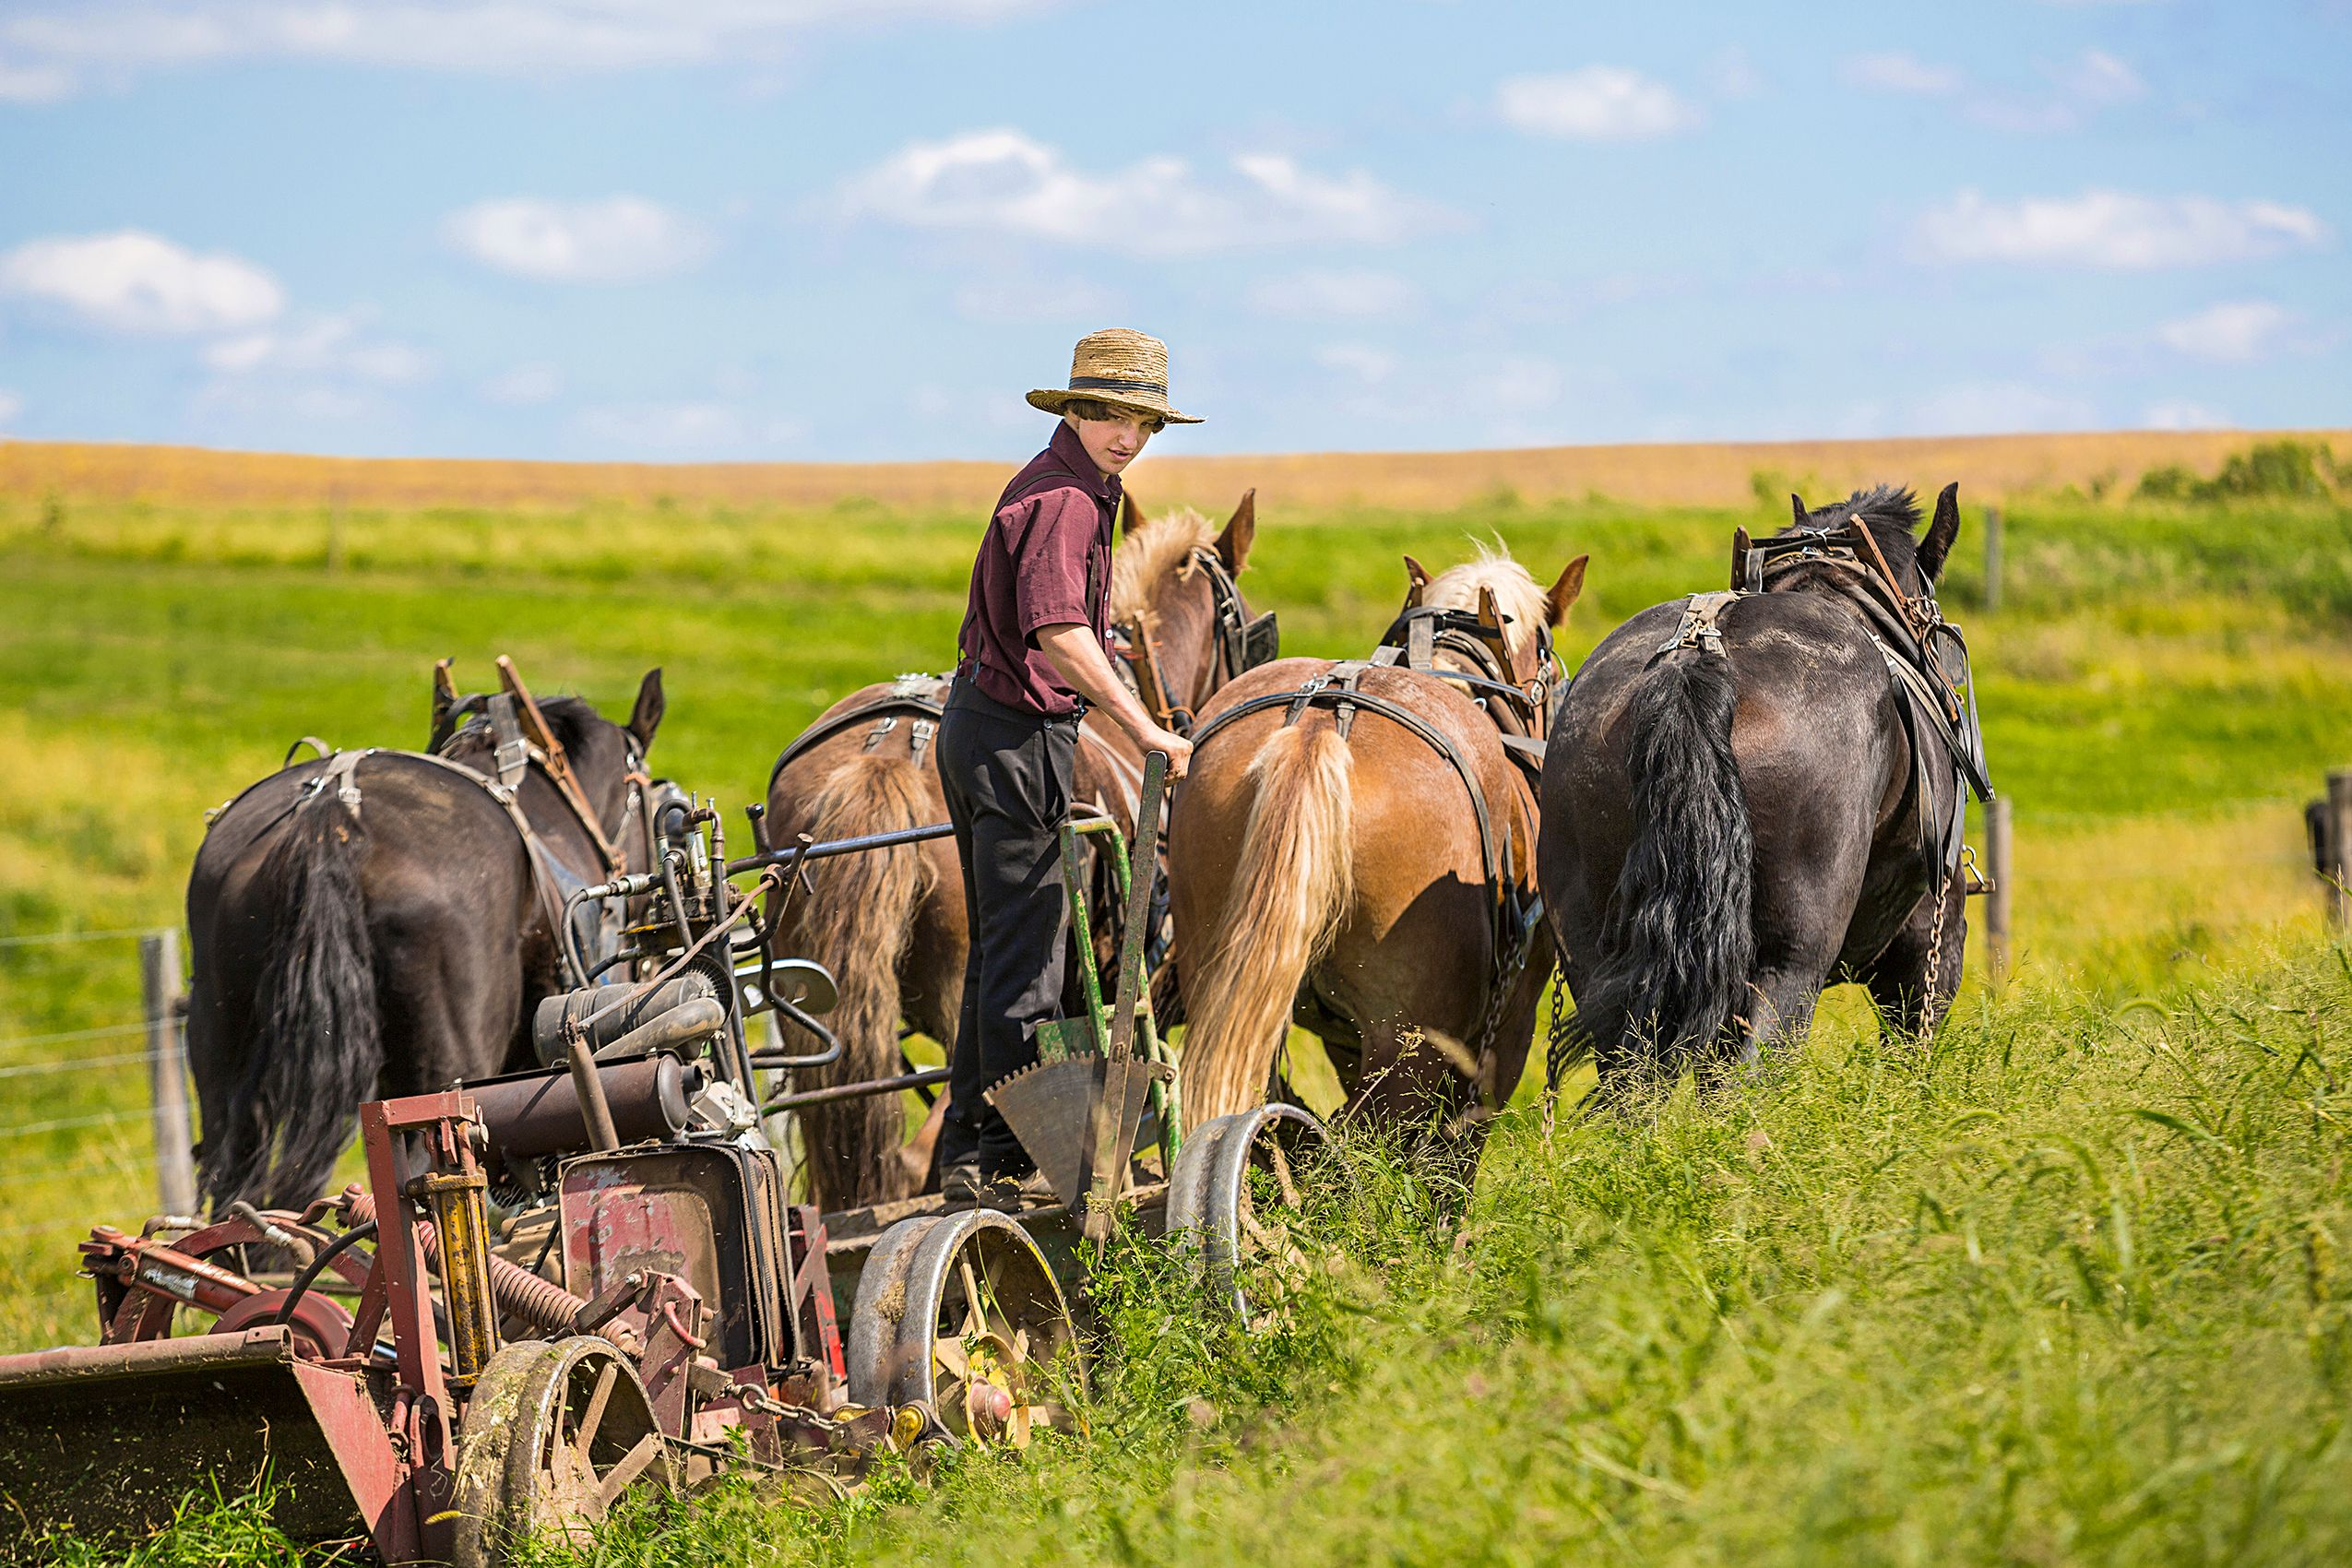 Amish_Boy_HARP8179_F.jpg